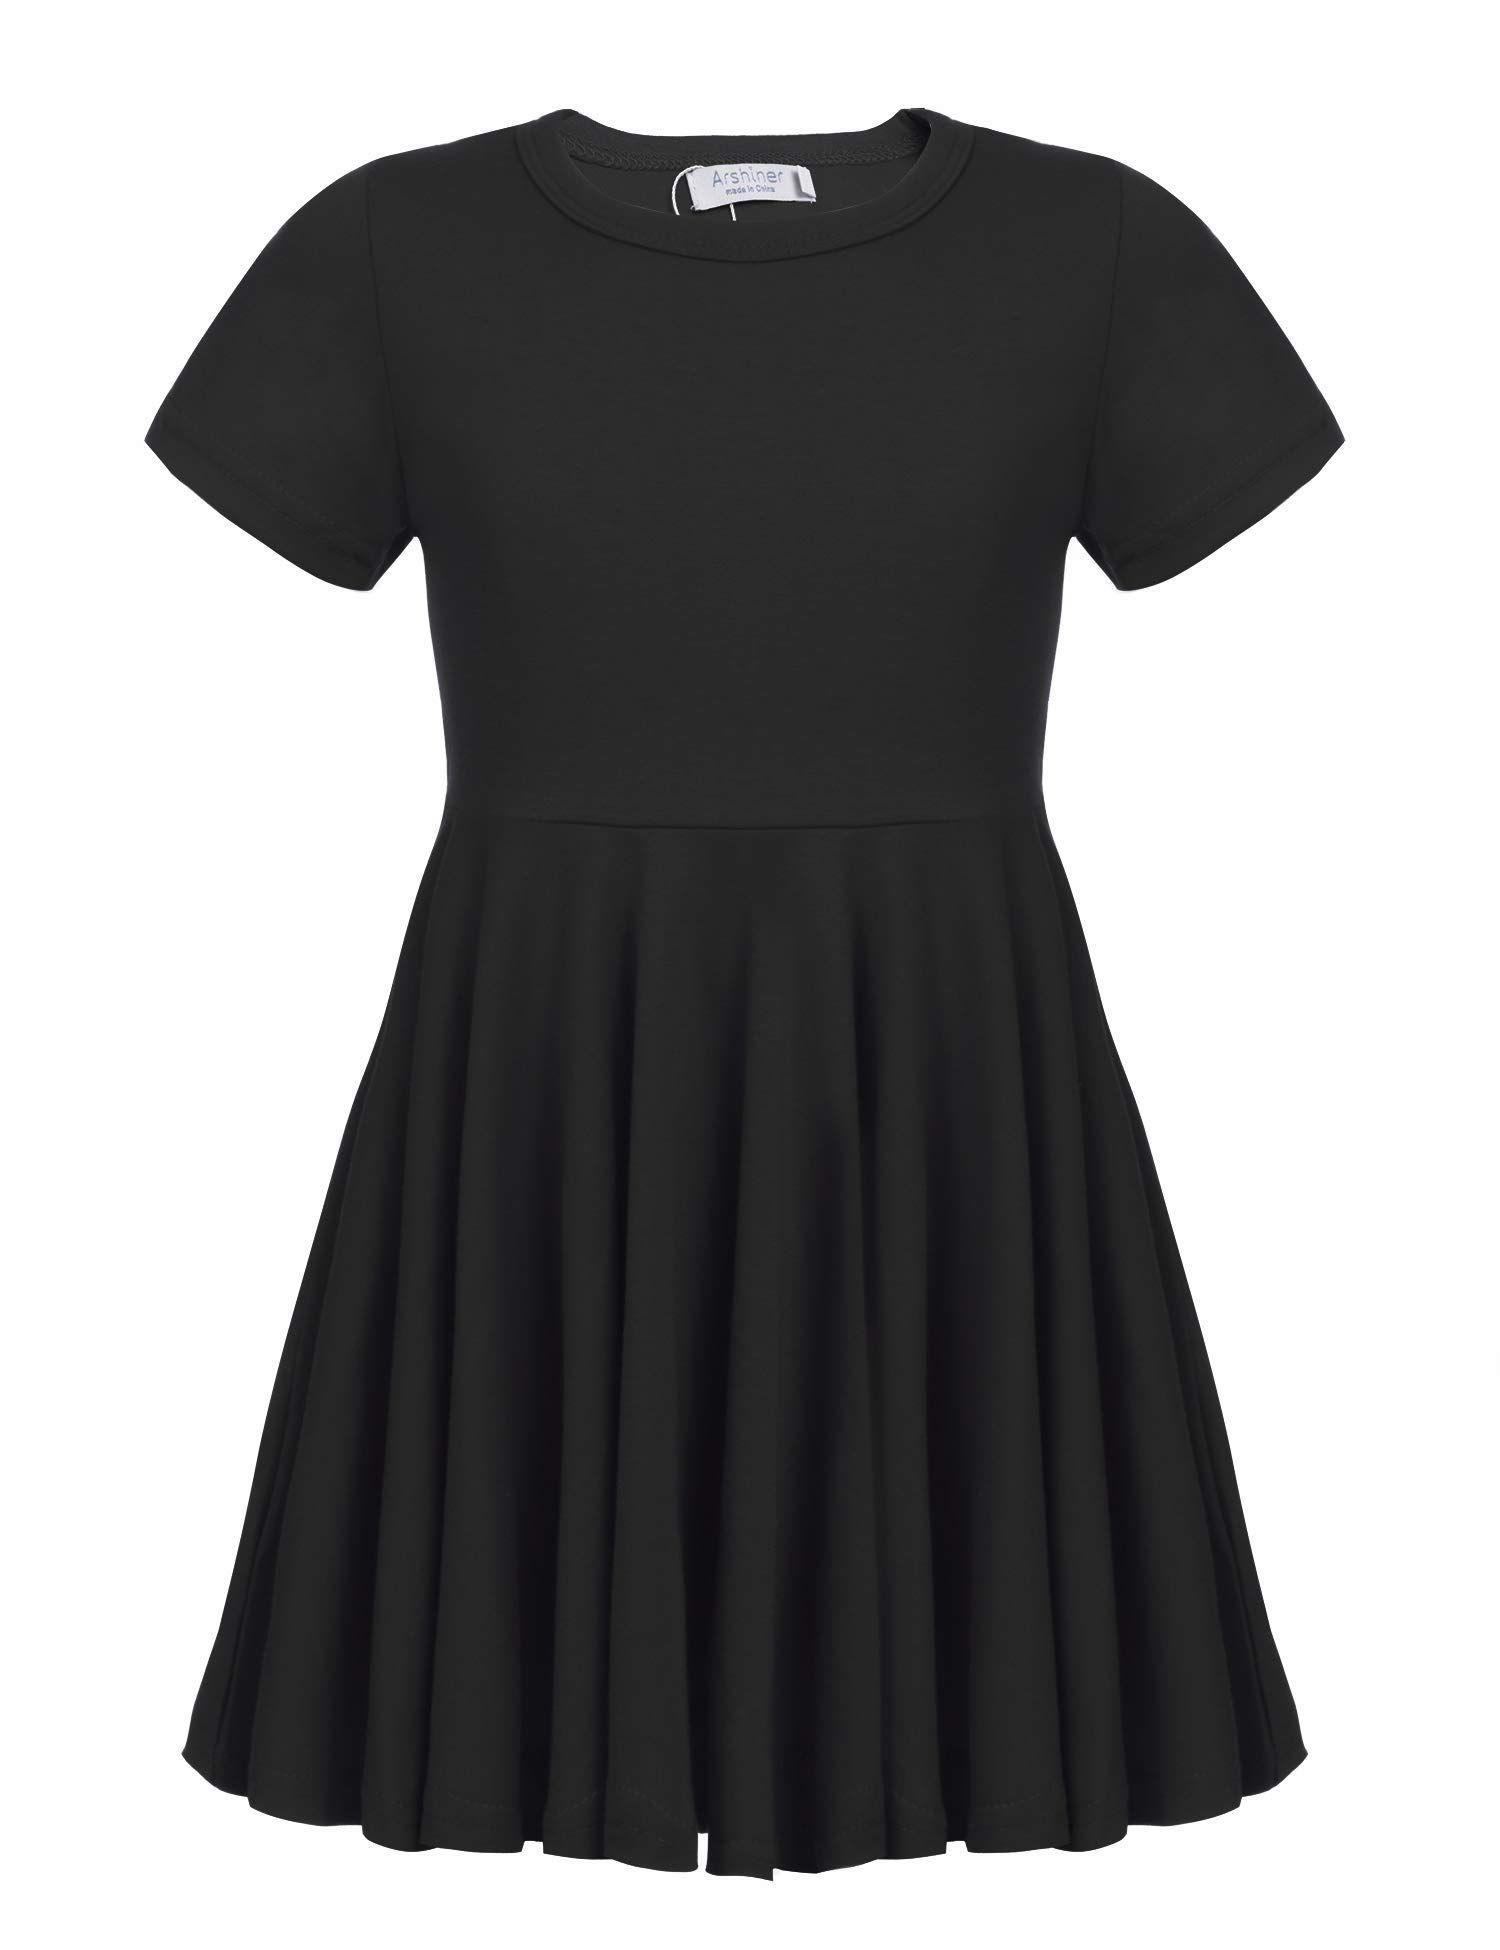 Arshiner Girls Short Sleeve//Sleeveless Dress A line Twirly Skater Casual Dress for 4-12 Years